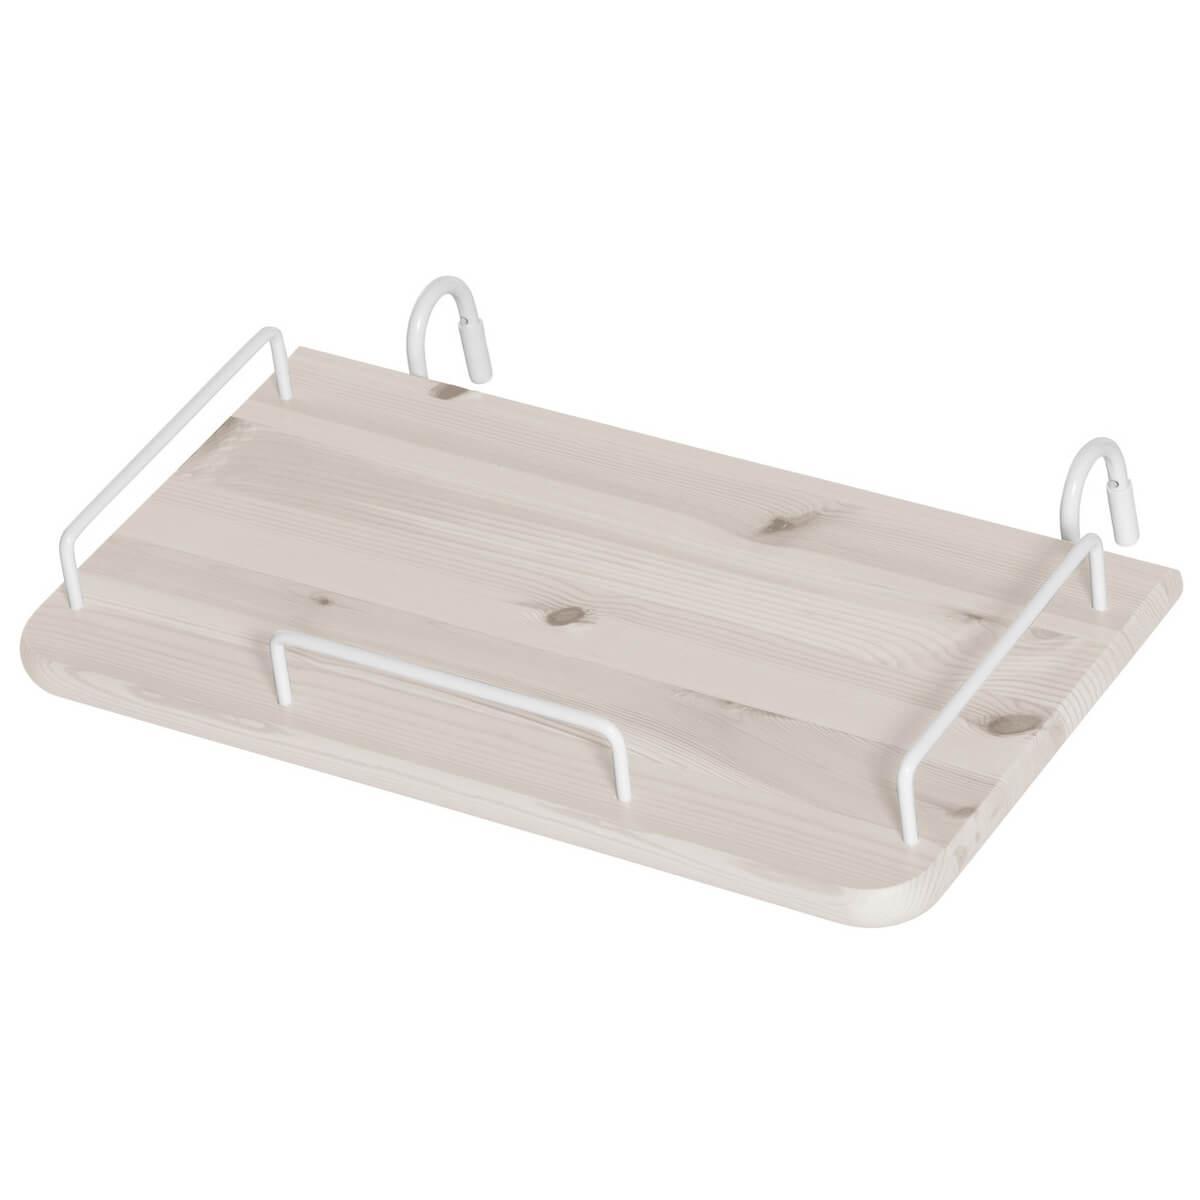 Table de chevet Flexa blanchi